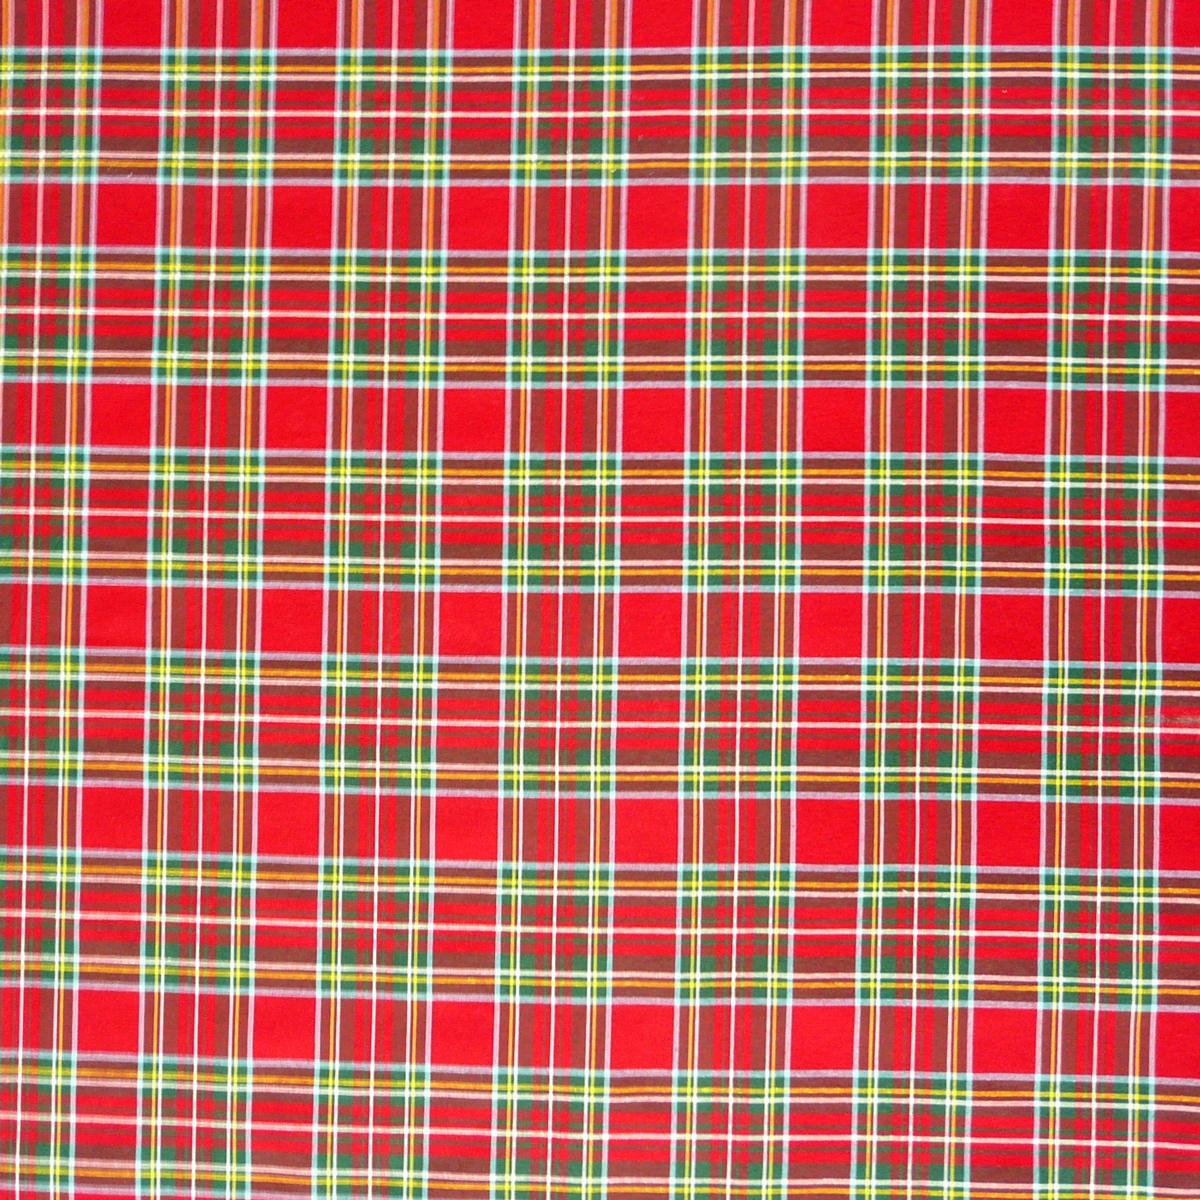 dekostoff baumwollstoff kariert rot gr n gelb blau wei stoffe wohnstoffe dekostoffe. Black Bedroom Furniture Sets. Home Design Ideas